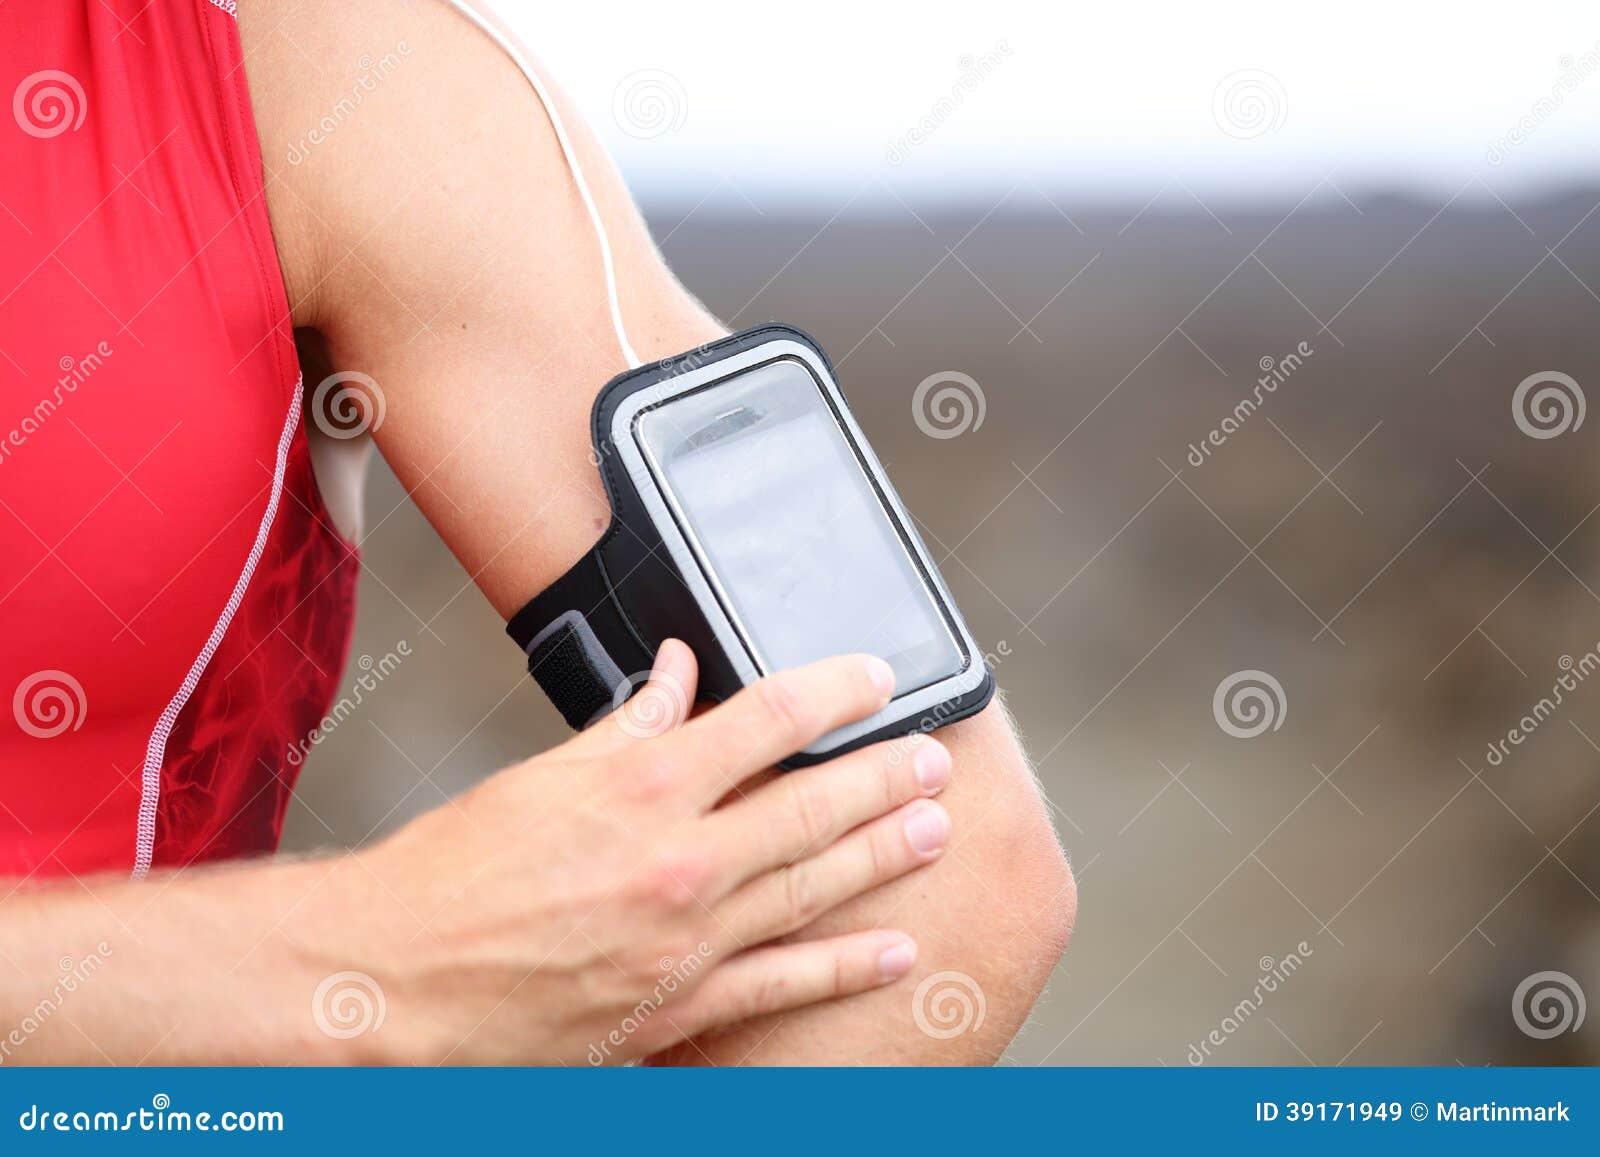 Smart phone running music closeup - male runner